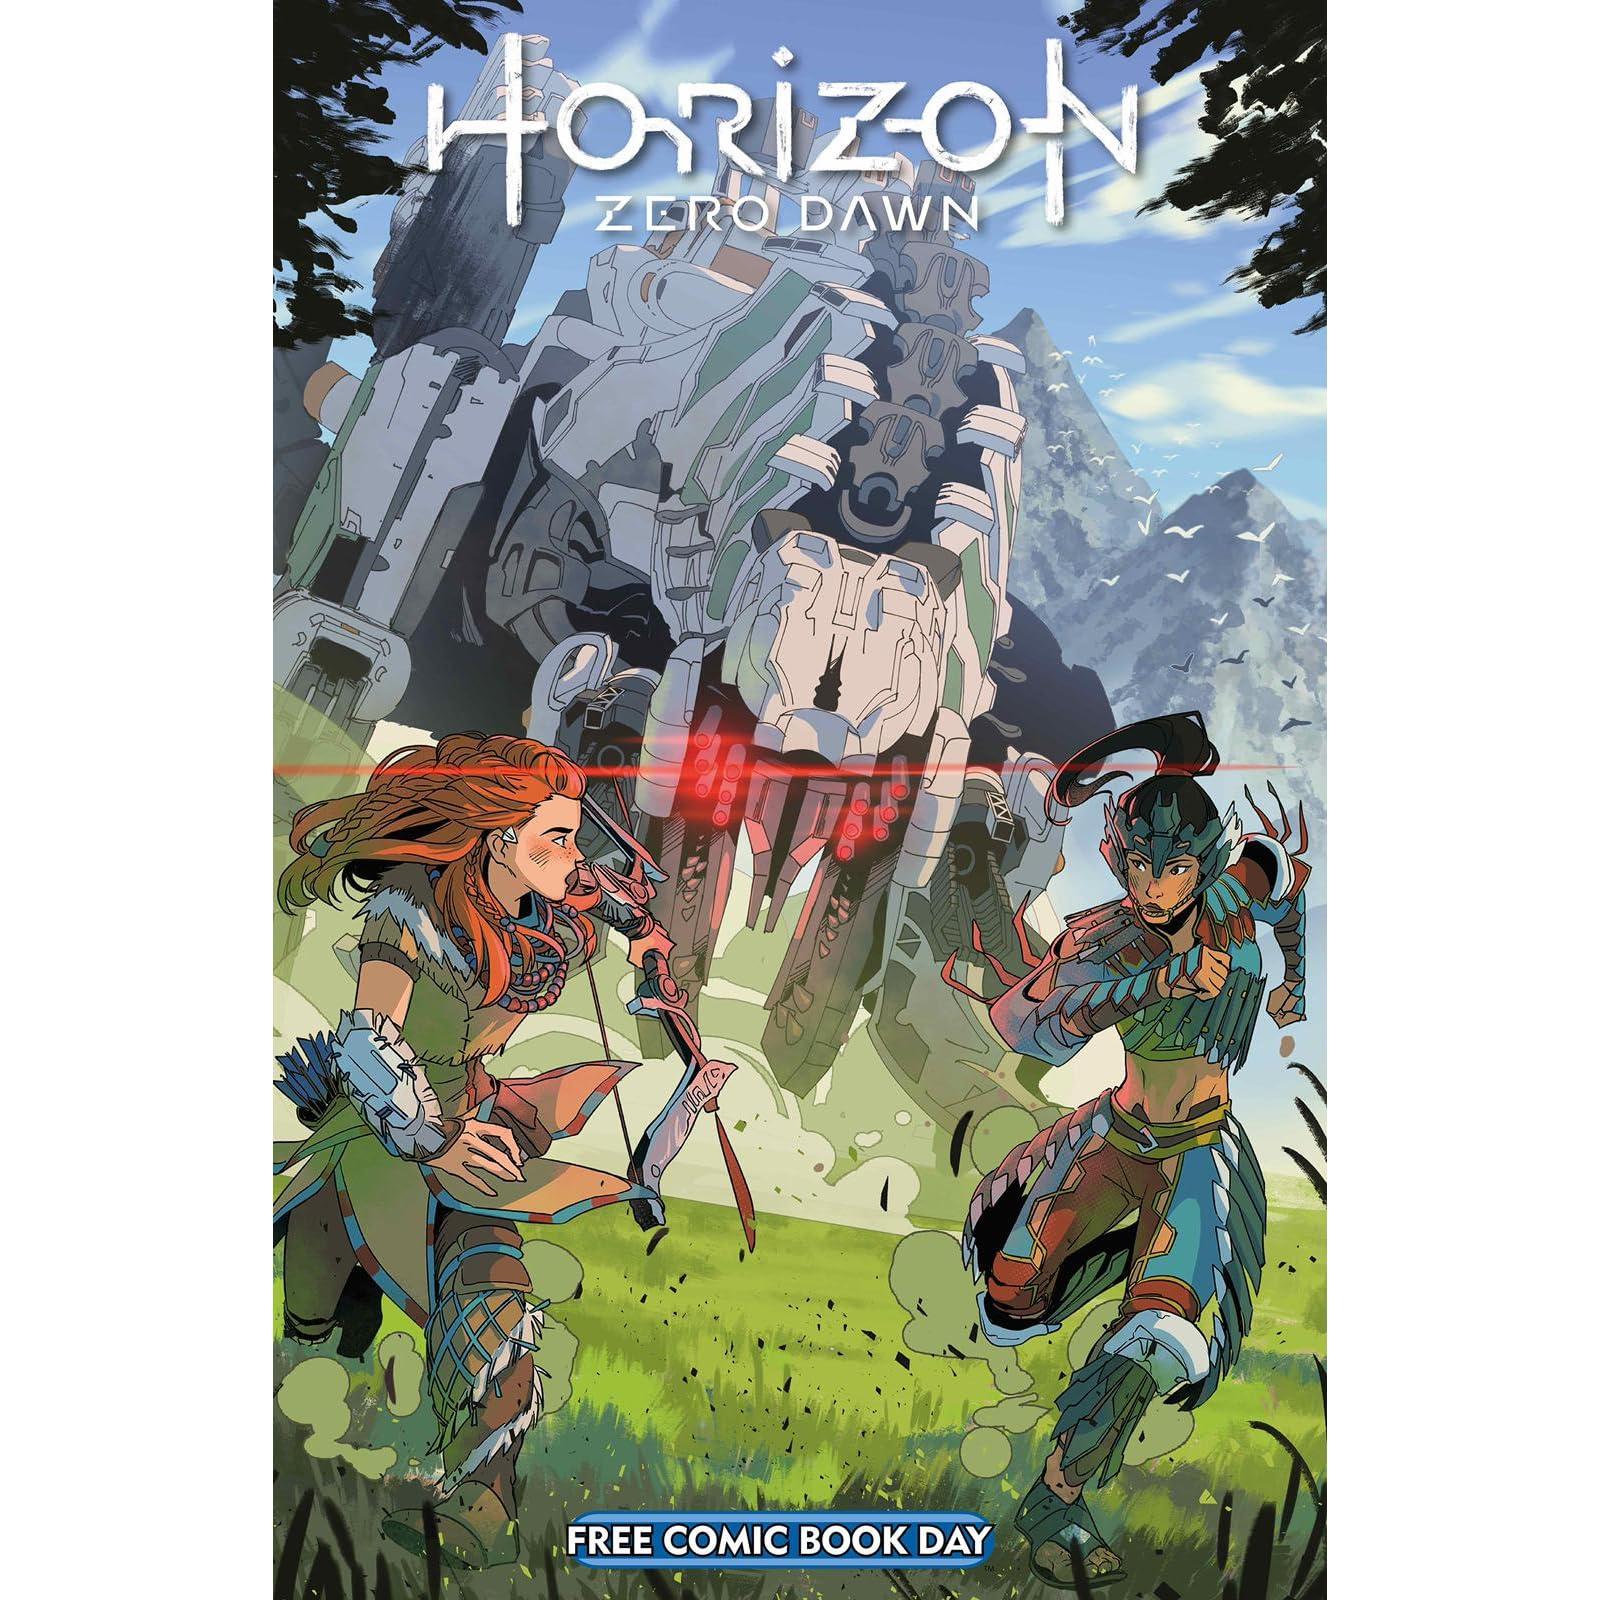 FCBD 2020 HORIZON ZERO DAWN COMIC TITAN 2020 1st Print